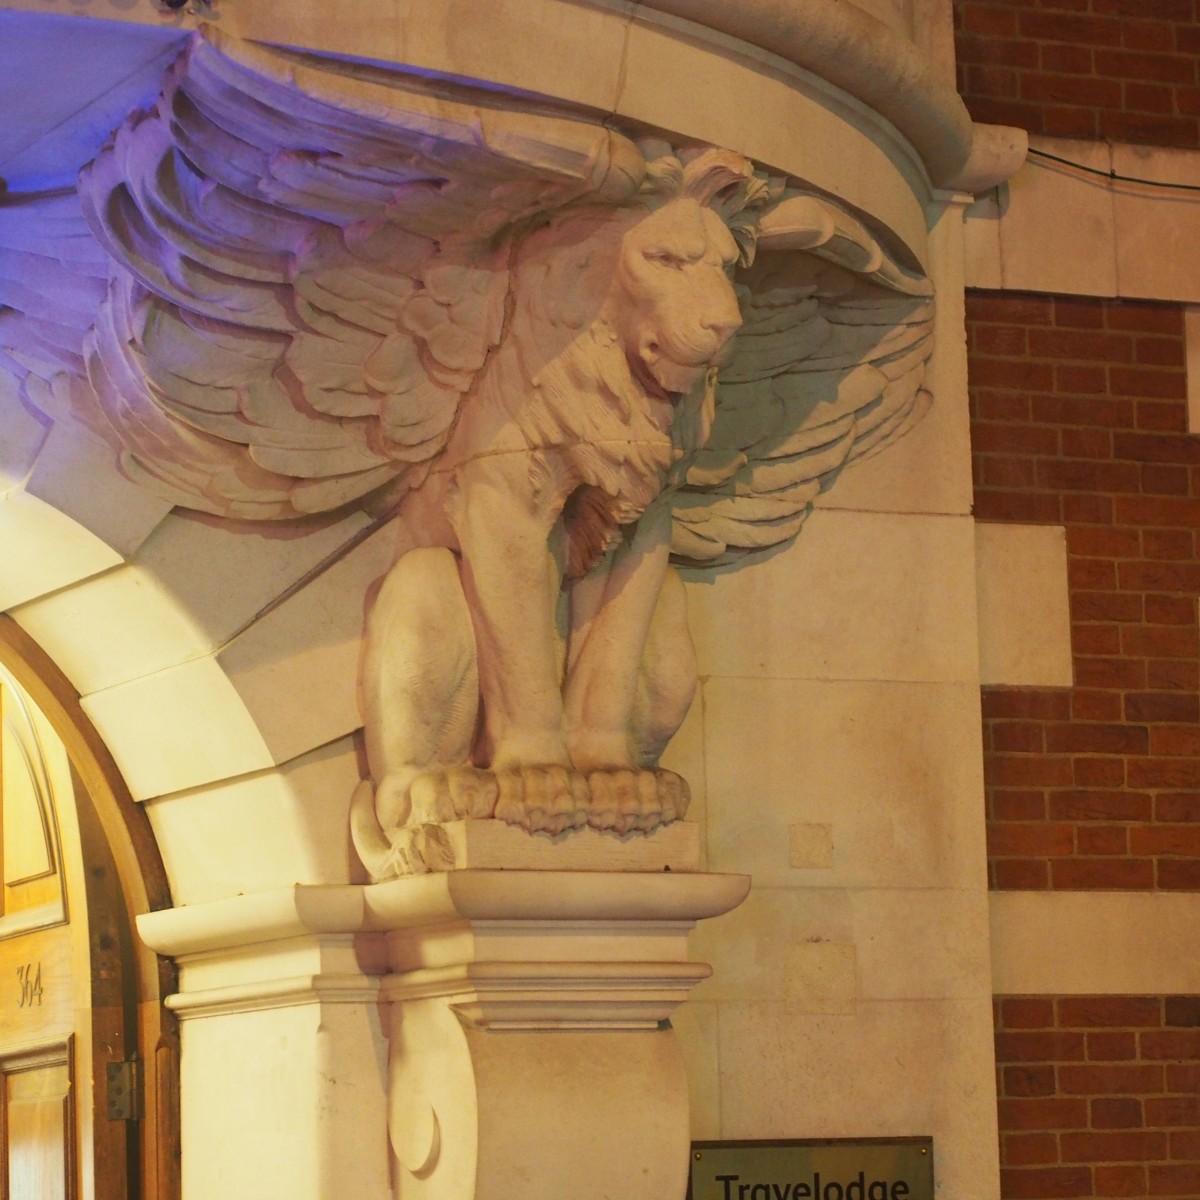 SuperRoom at Travelodge London Kings Cross*